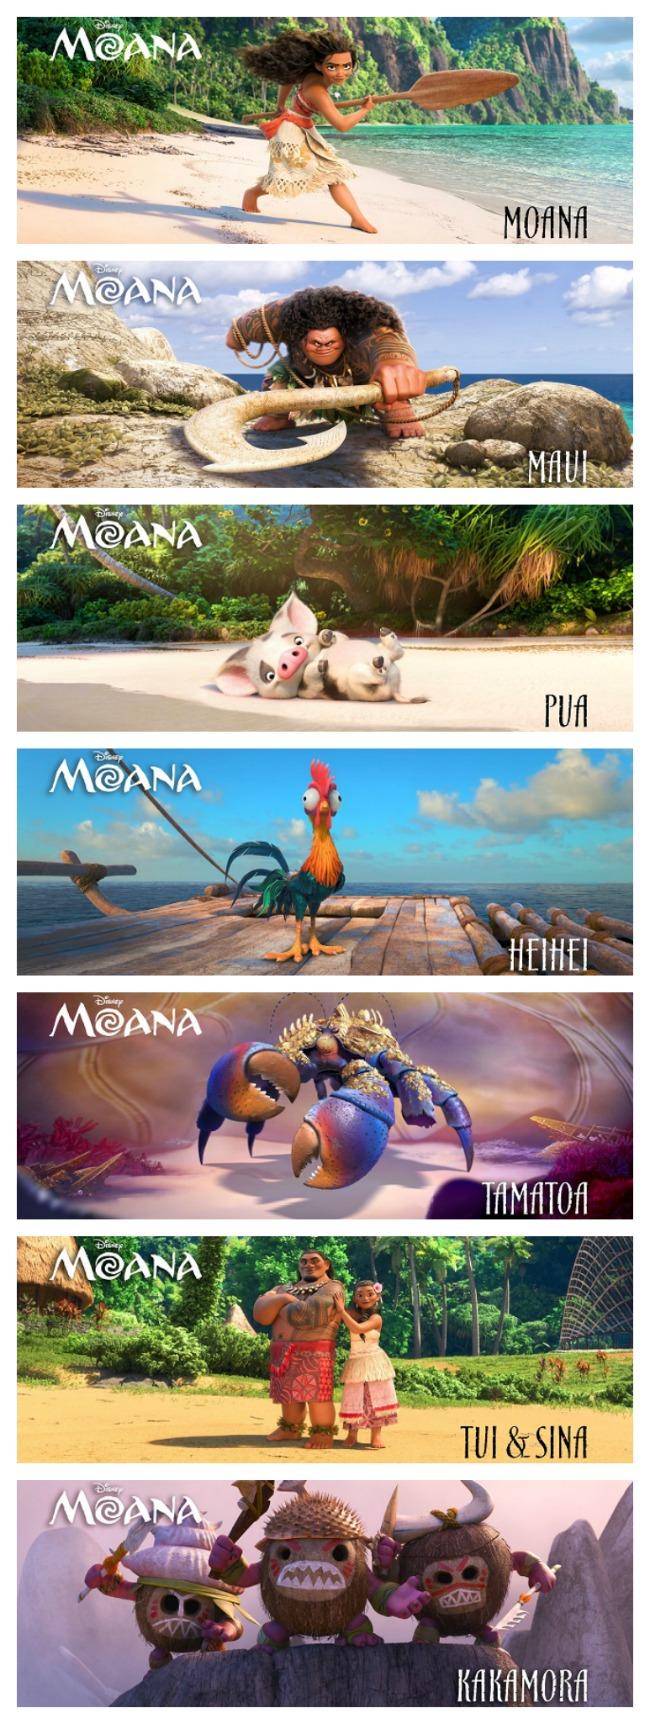 Moana characters pinterest